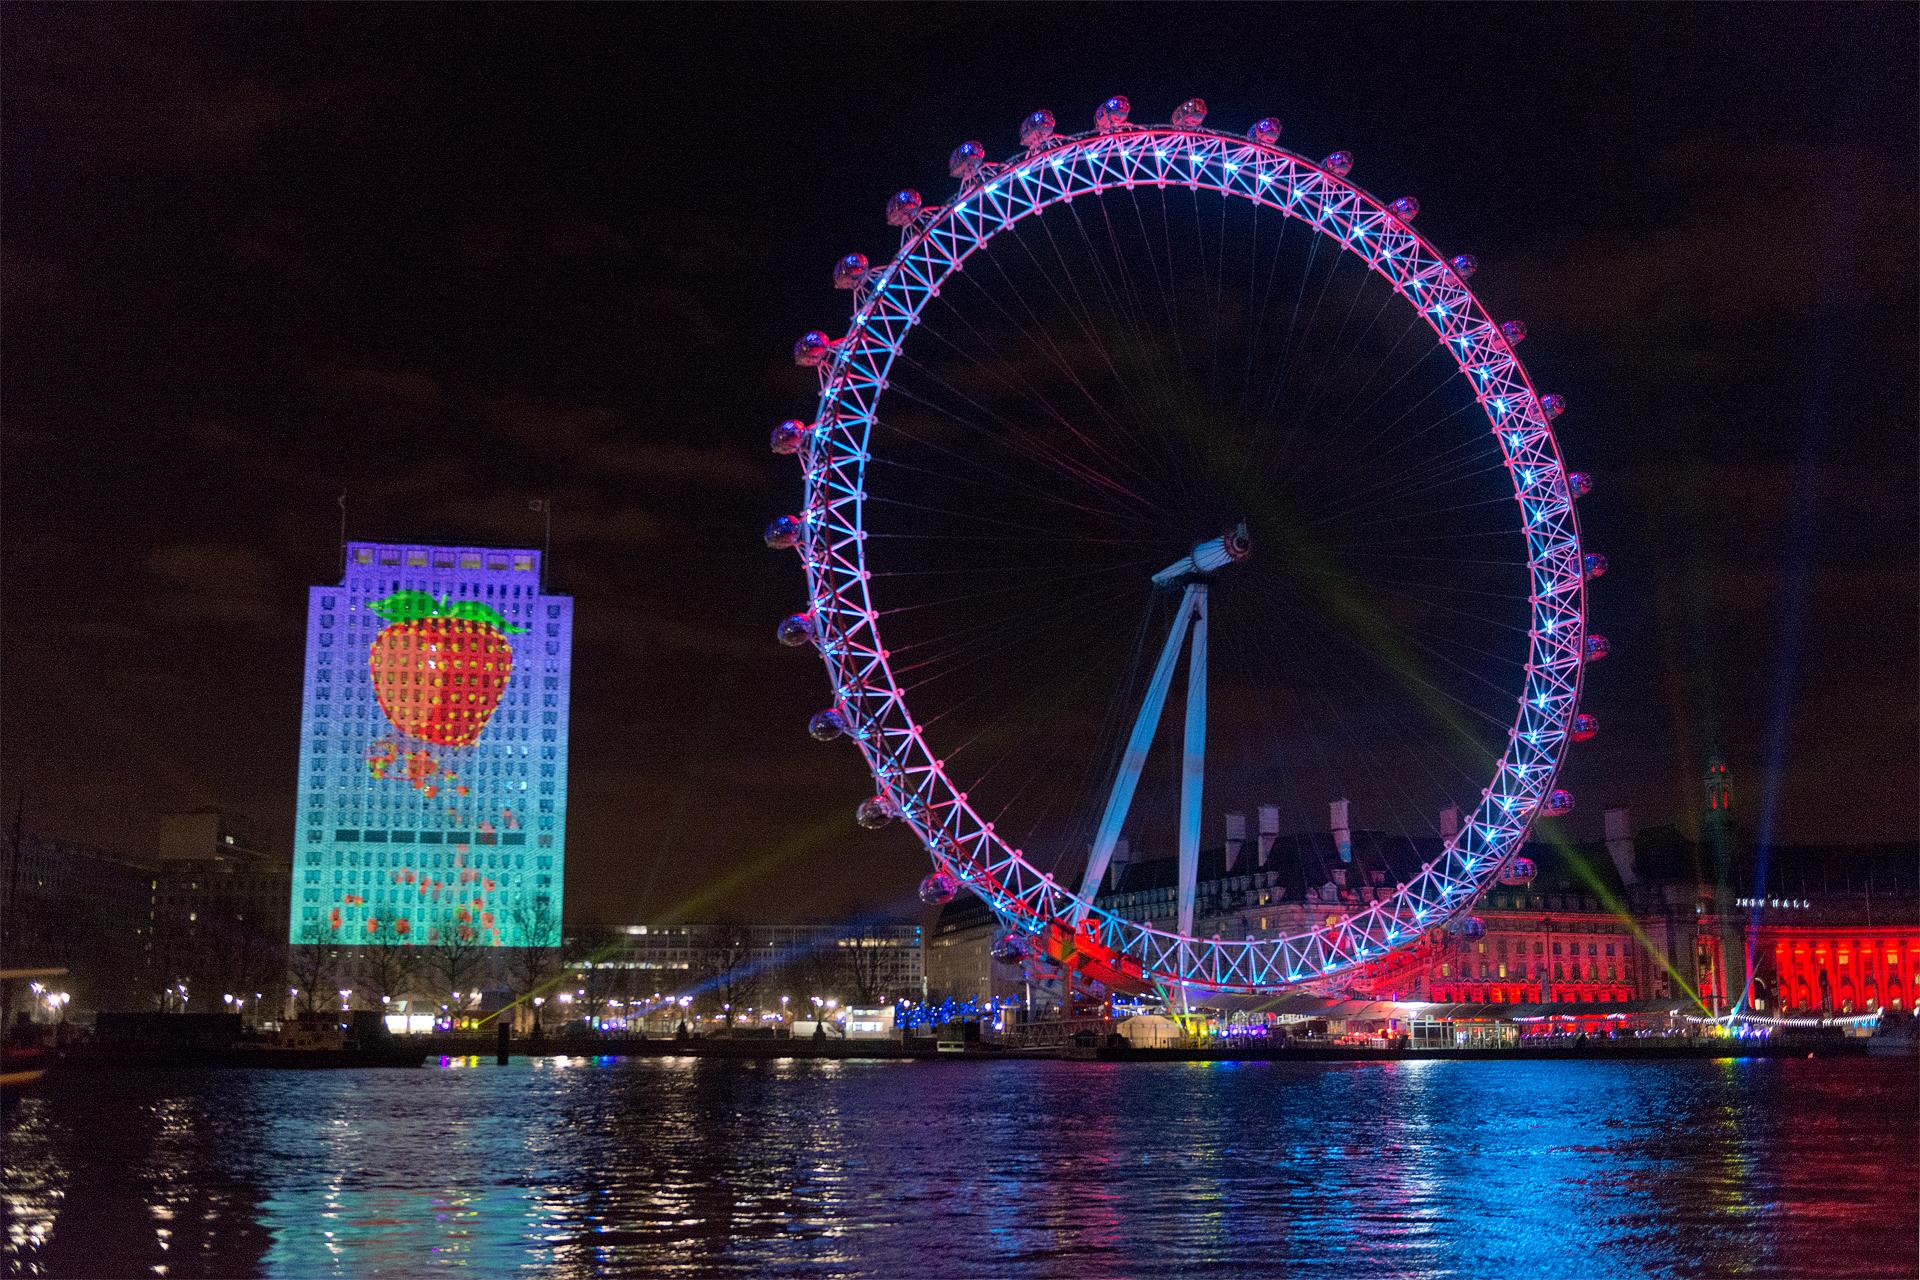 Vodafone • Mayor of London's New Year's Eve Fireworks 2013